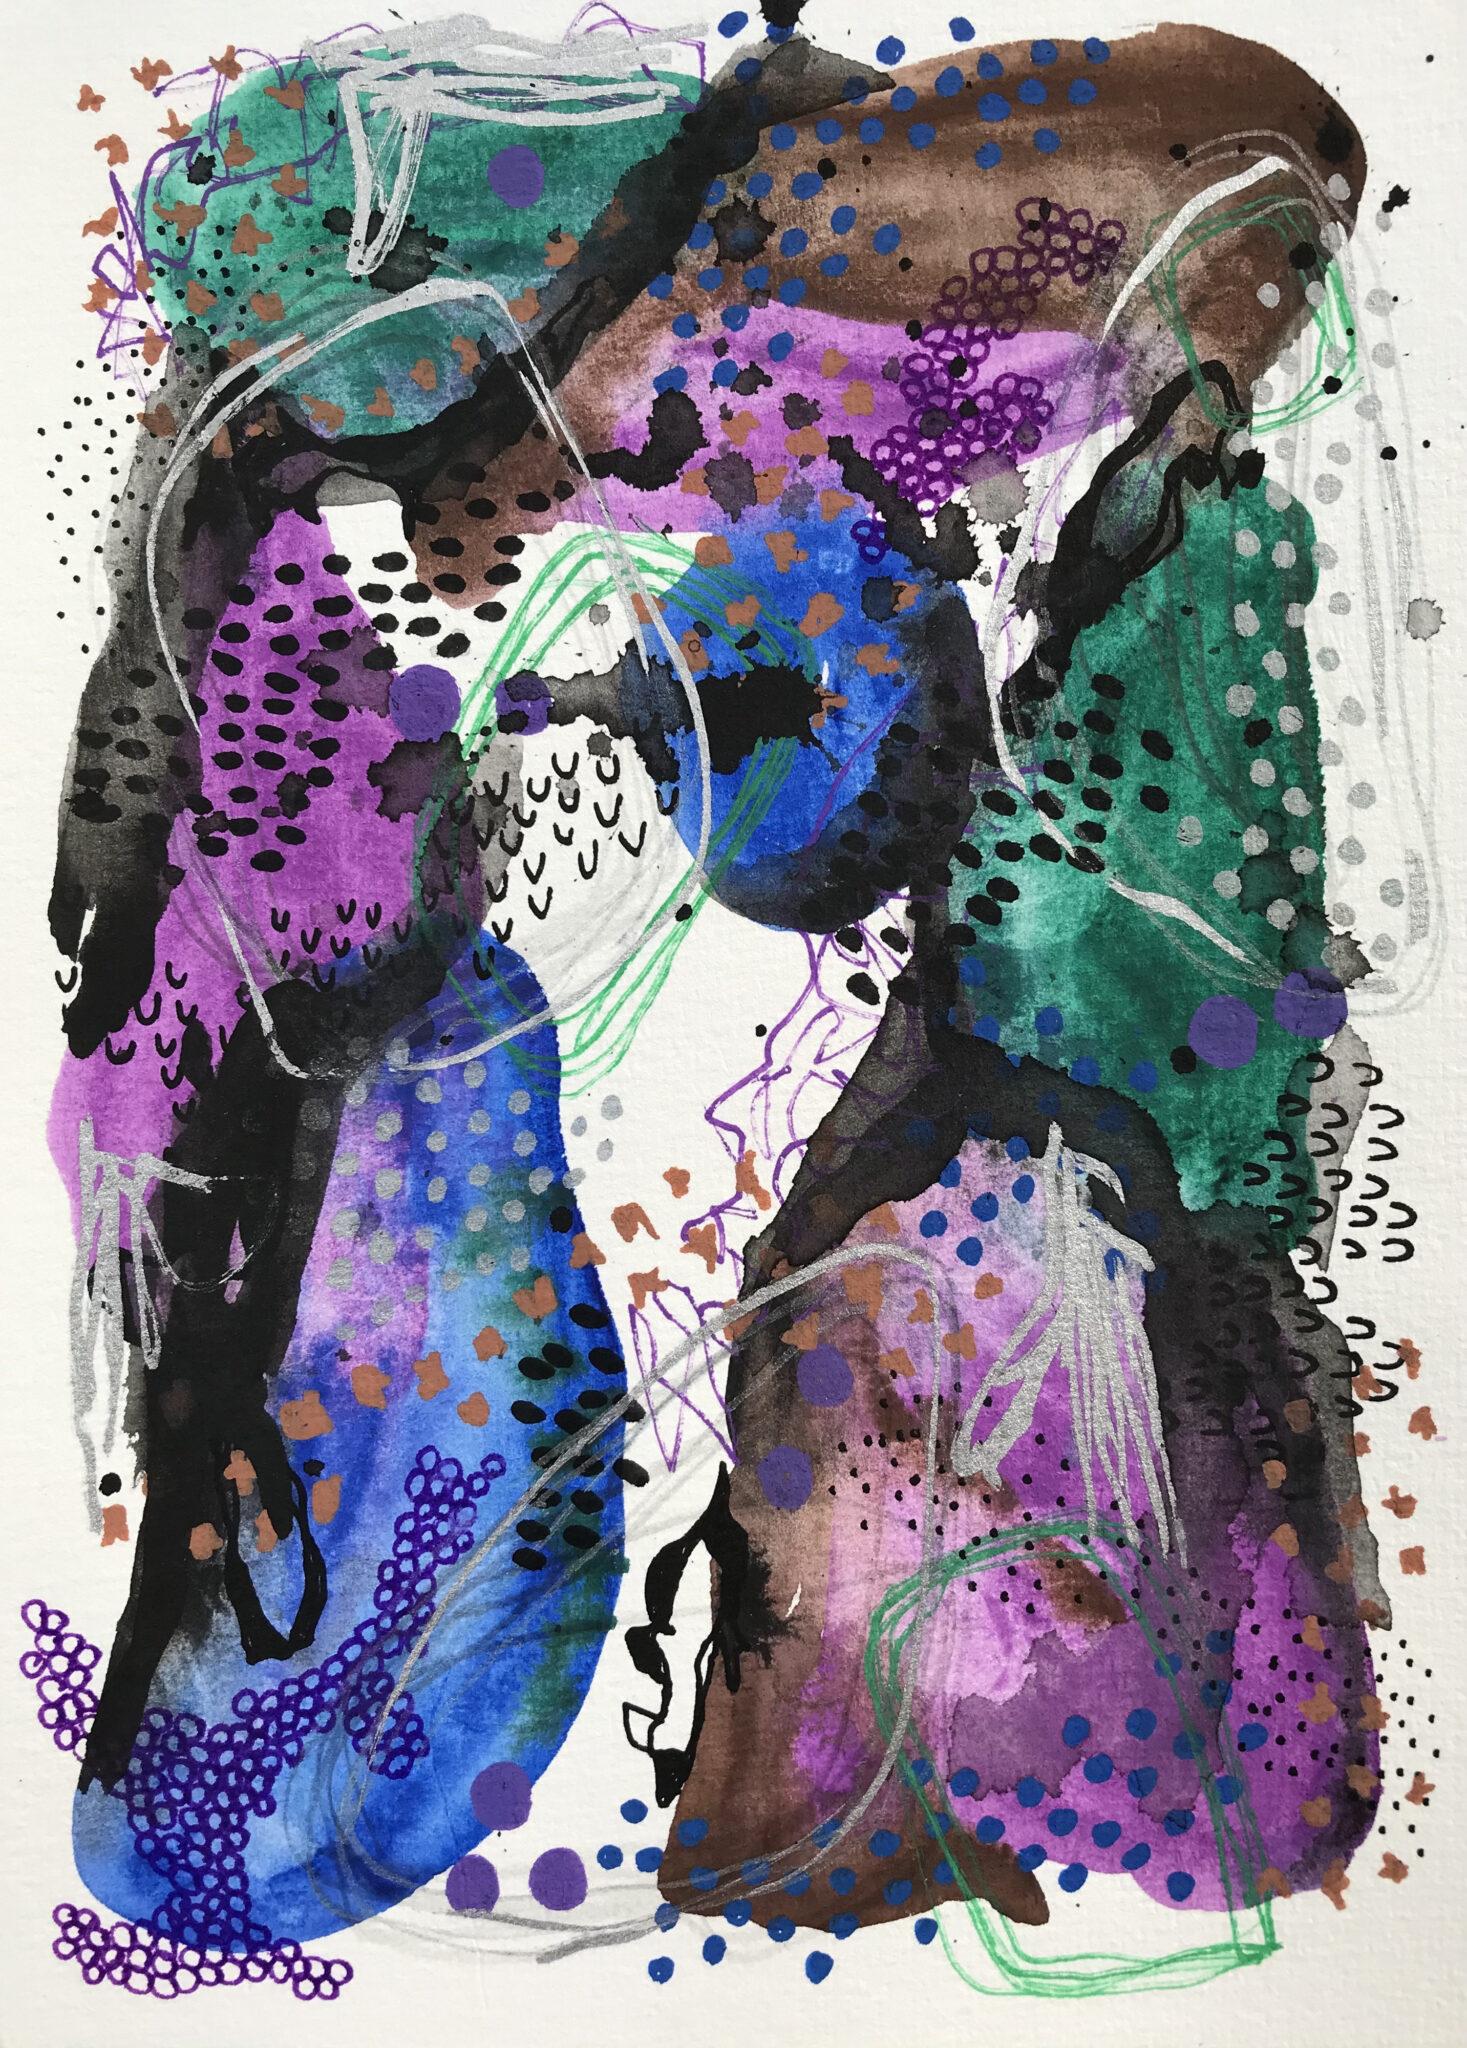 Hot Mess 2 – Mixed Media Original Artwork By Tish Willo Creative